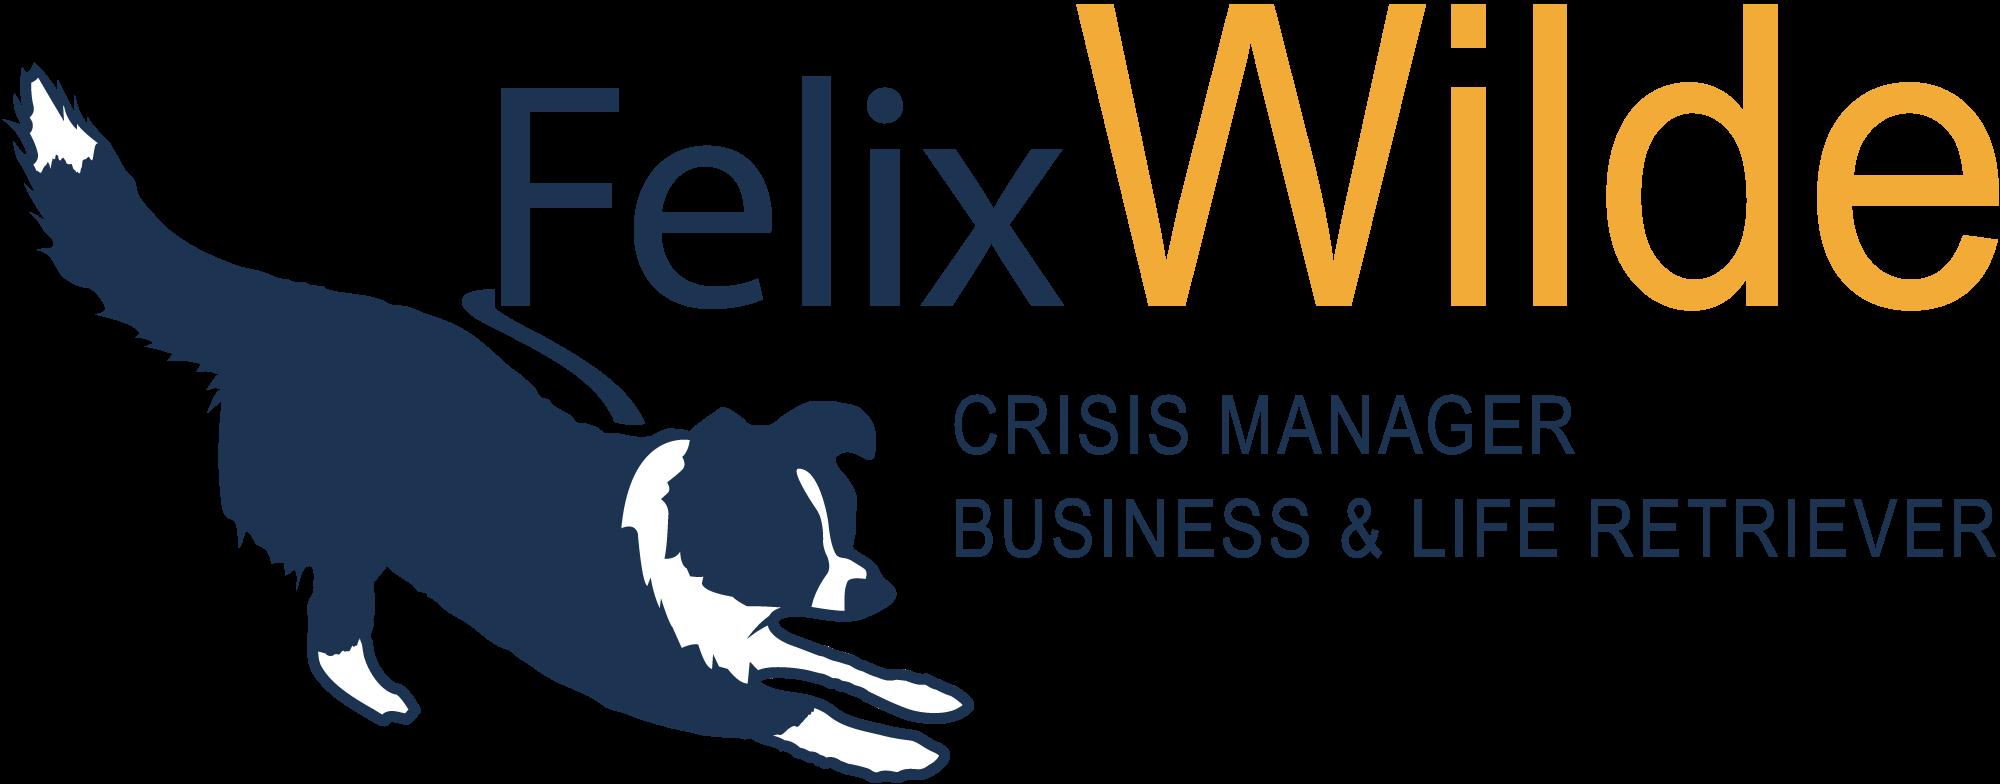 WILDE(s) CRISIS MISSION Logo